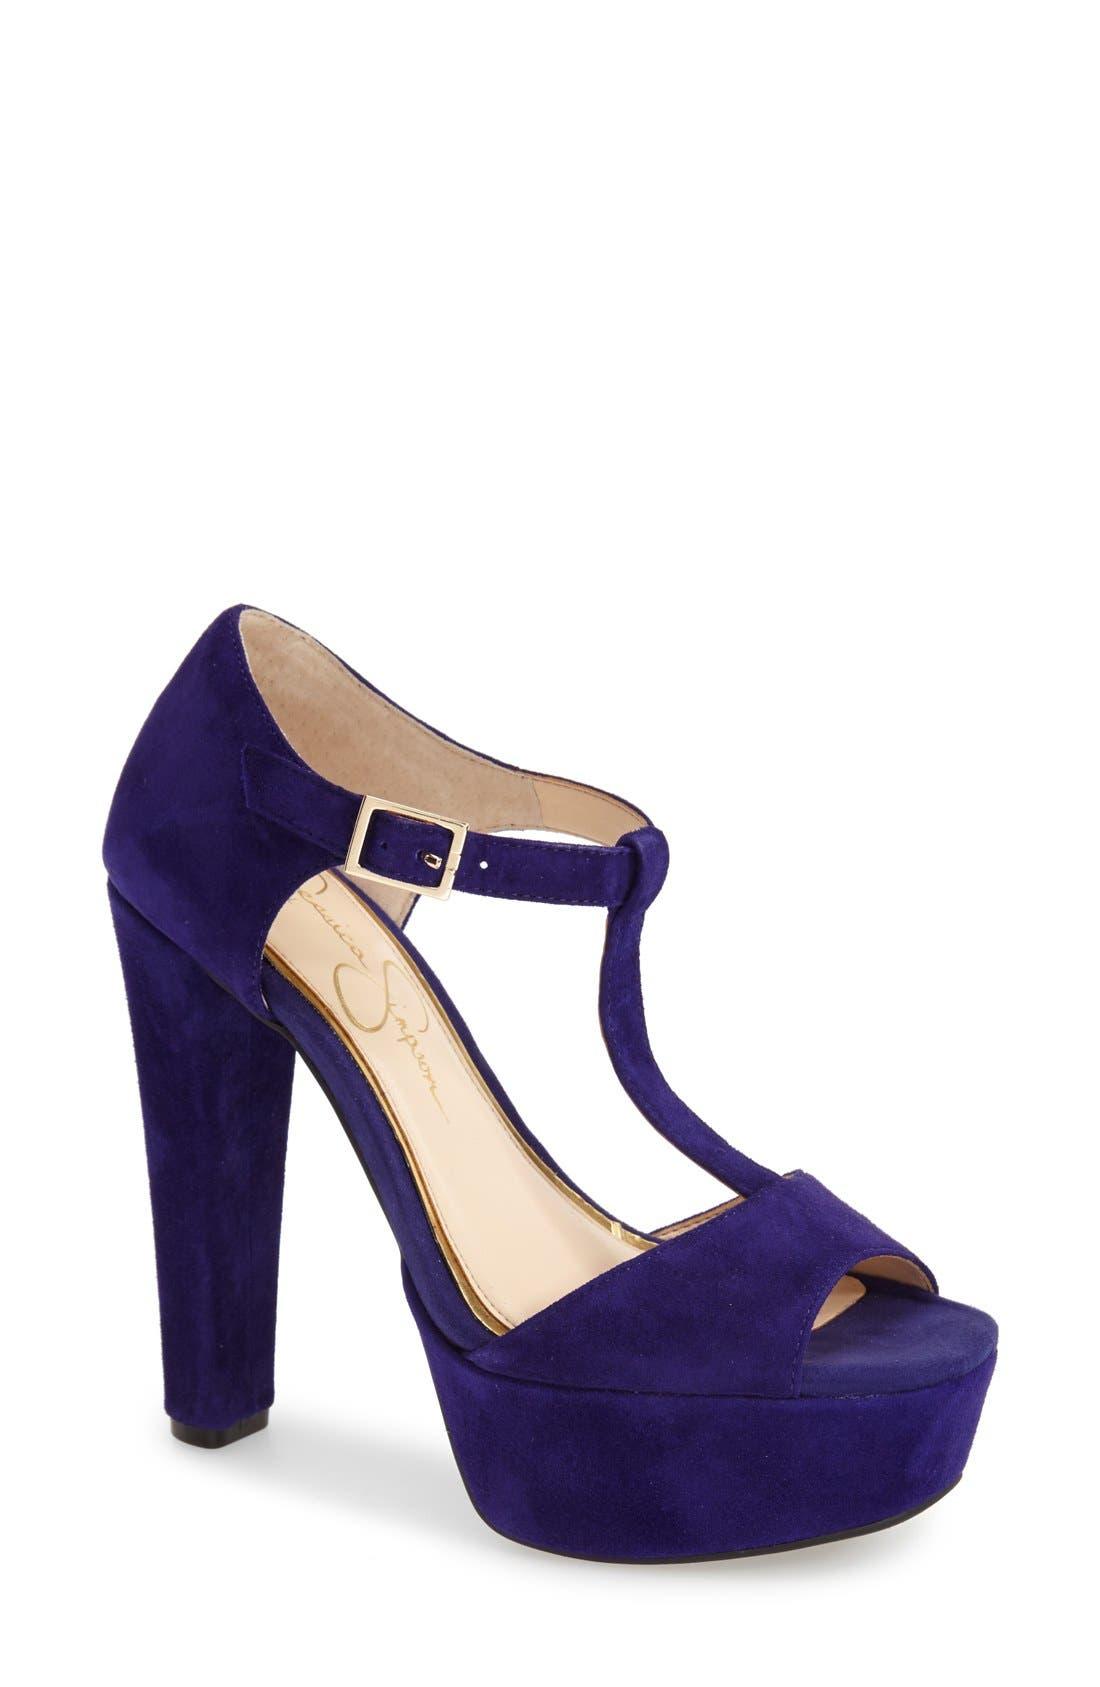 Main Image - Jessica Simpson 'Adelinah' T-Strap Platform Sandal (Women)